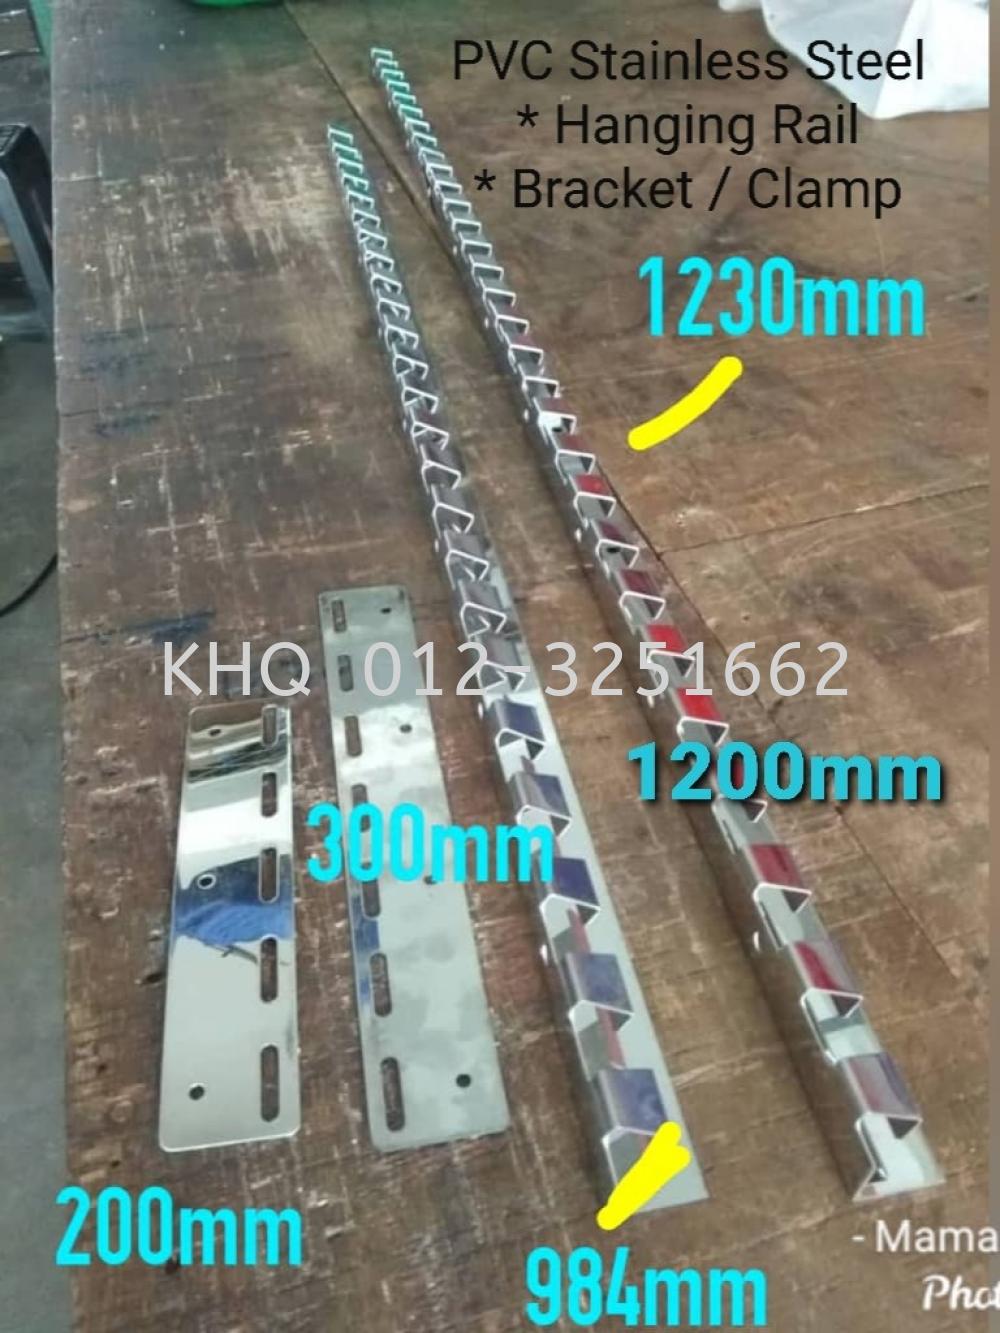 PVC Curtain Stainless Steel Hanger Rail / Bracket / Clamp